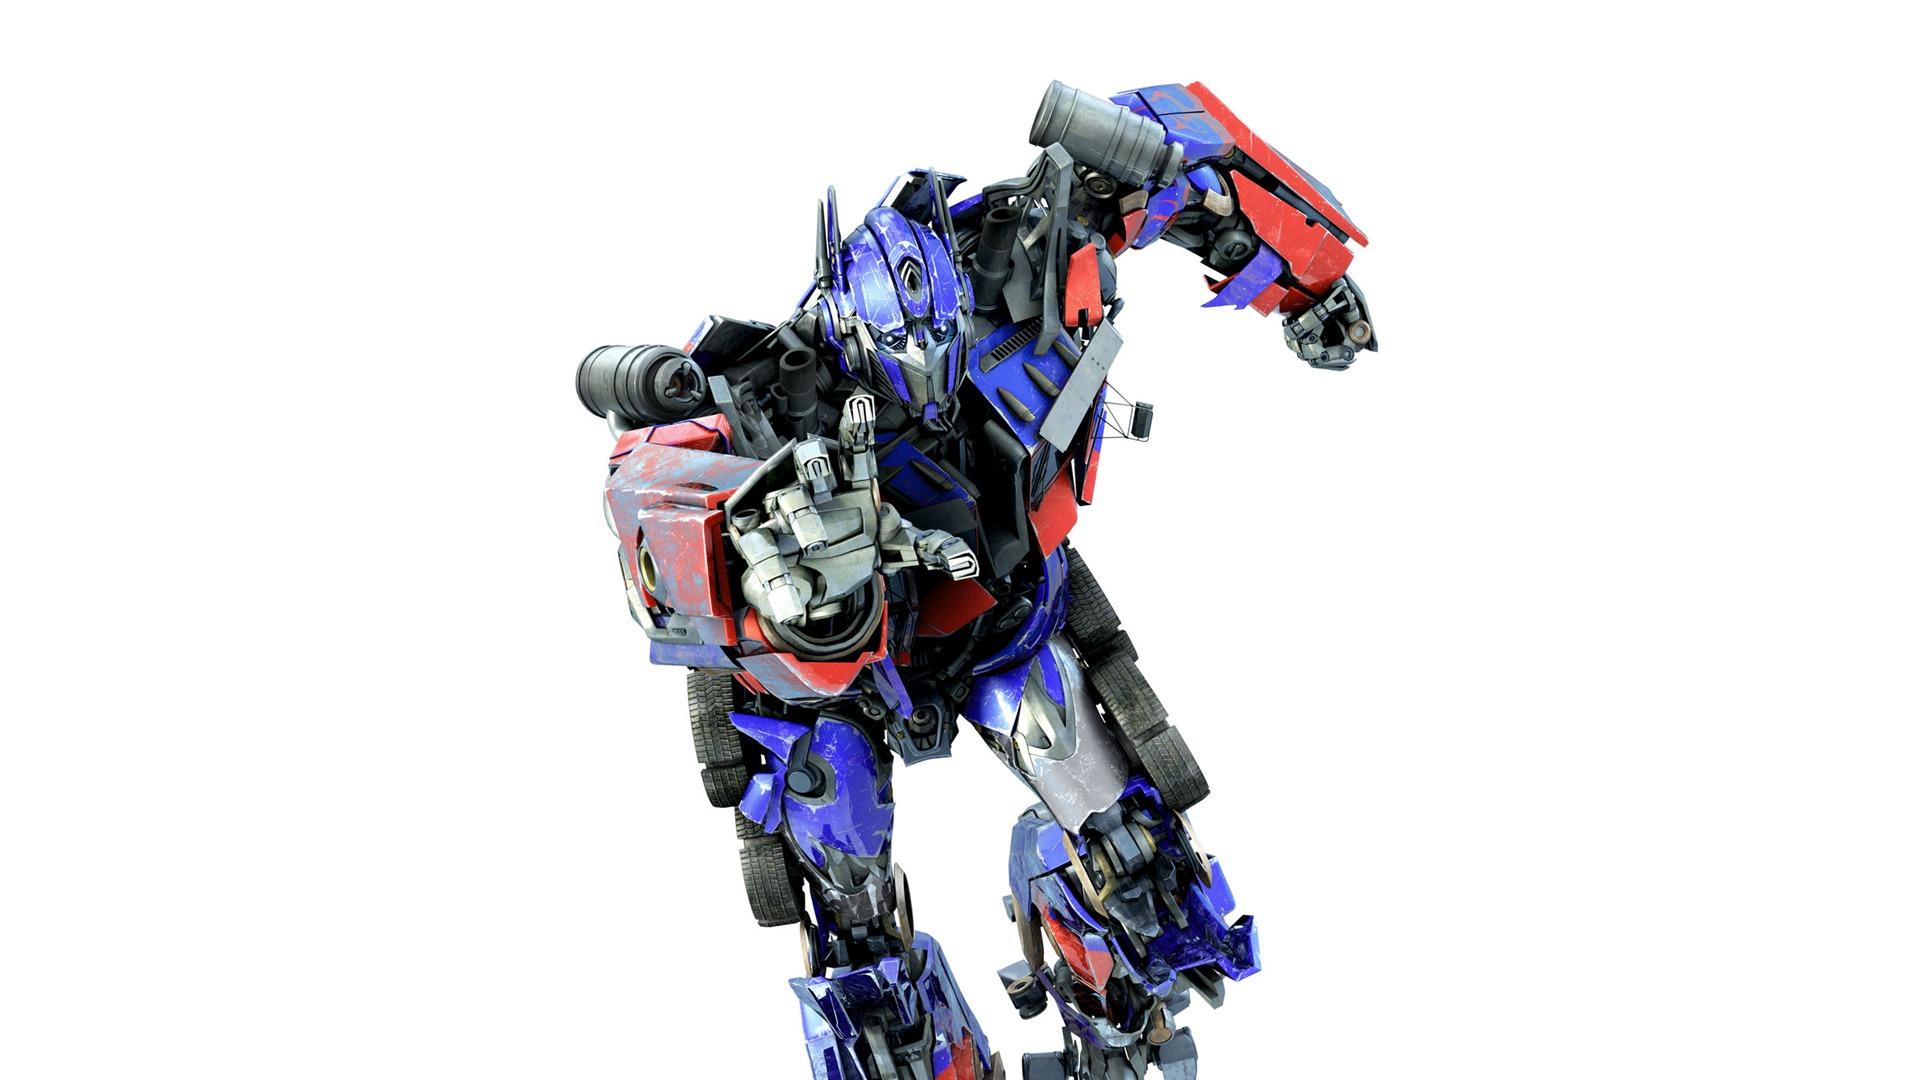 Transformers 2 fonds d 39 cran hd de style 2 10 for Fond ecran style